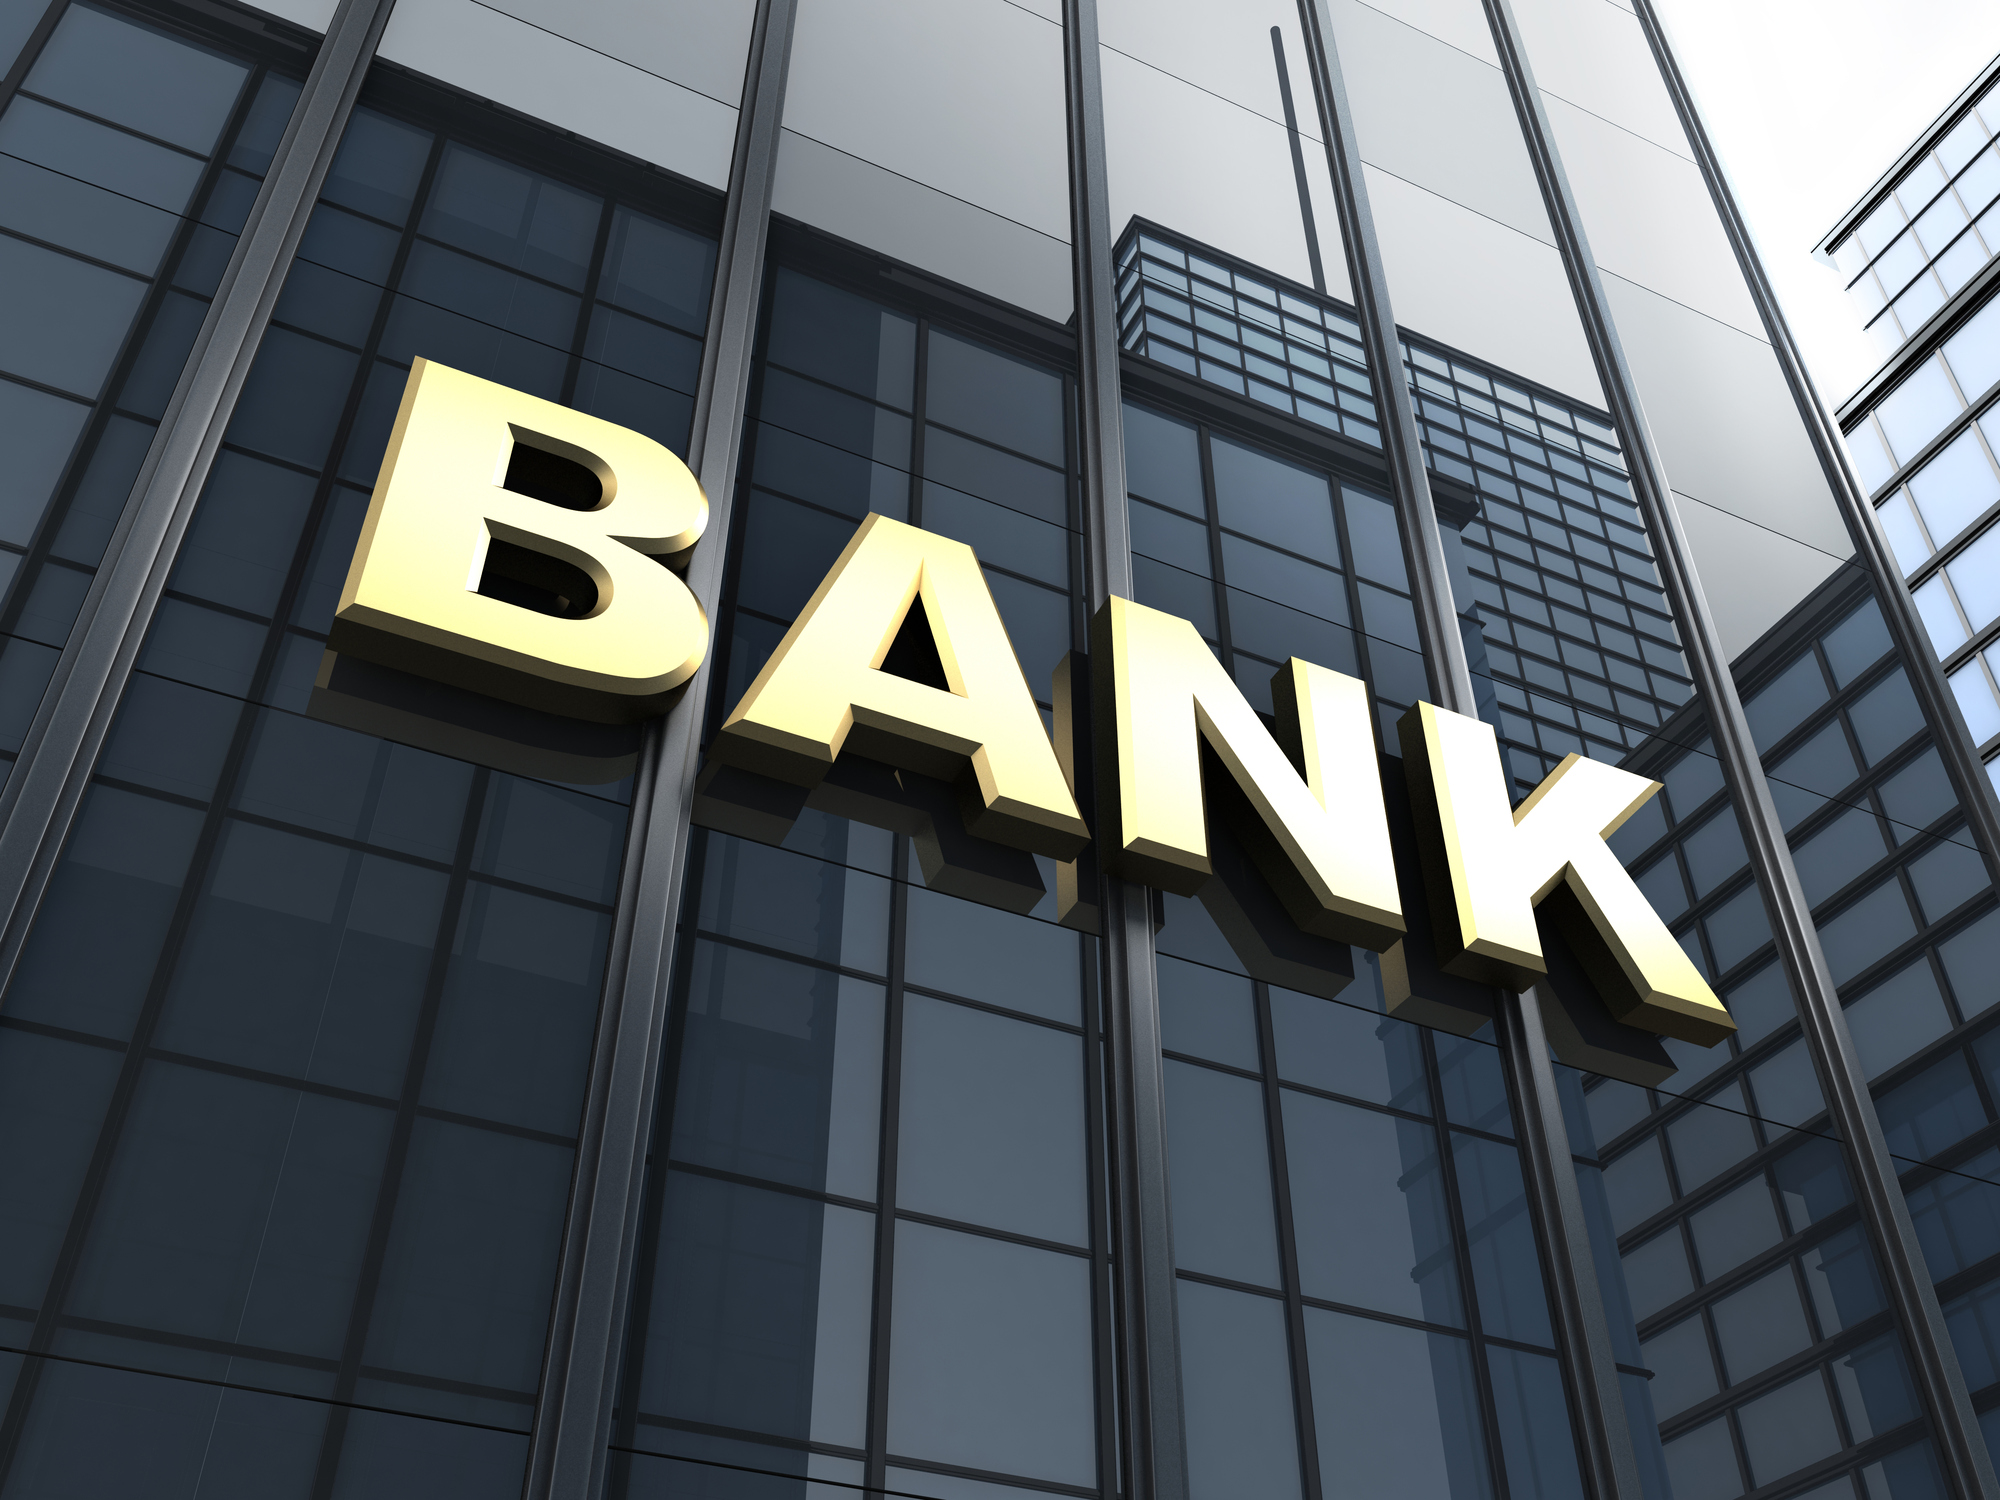 WiMAXを口座振替指定できる金融機関・銀行は?